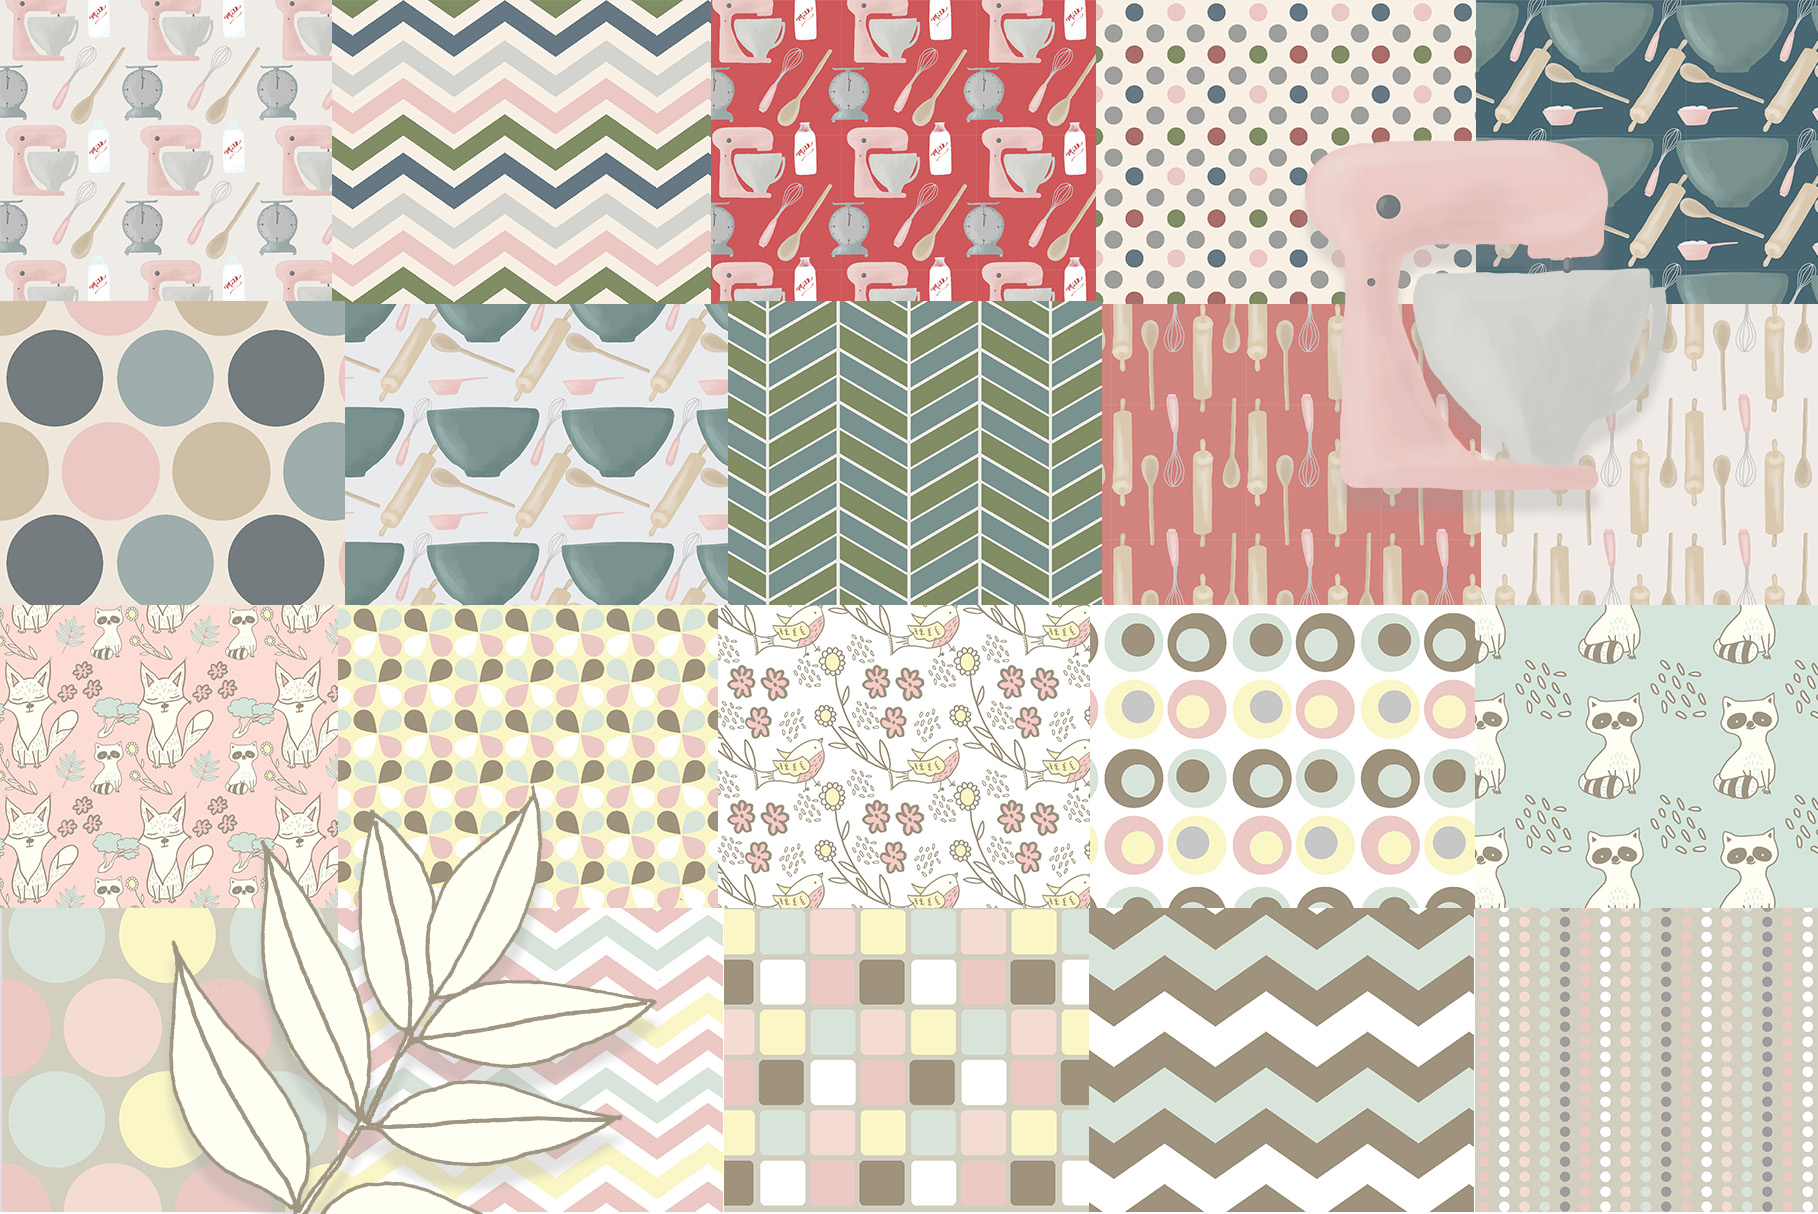 Patterns Bundle, Digital Patterns, Seamless Patterns, Digital Wallpaper Example Image